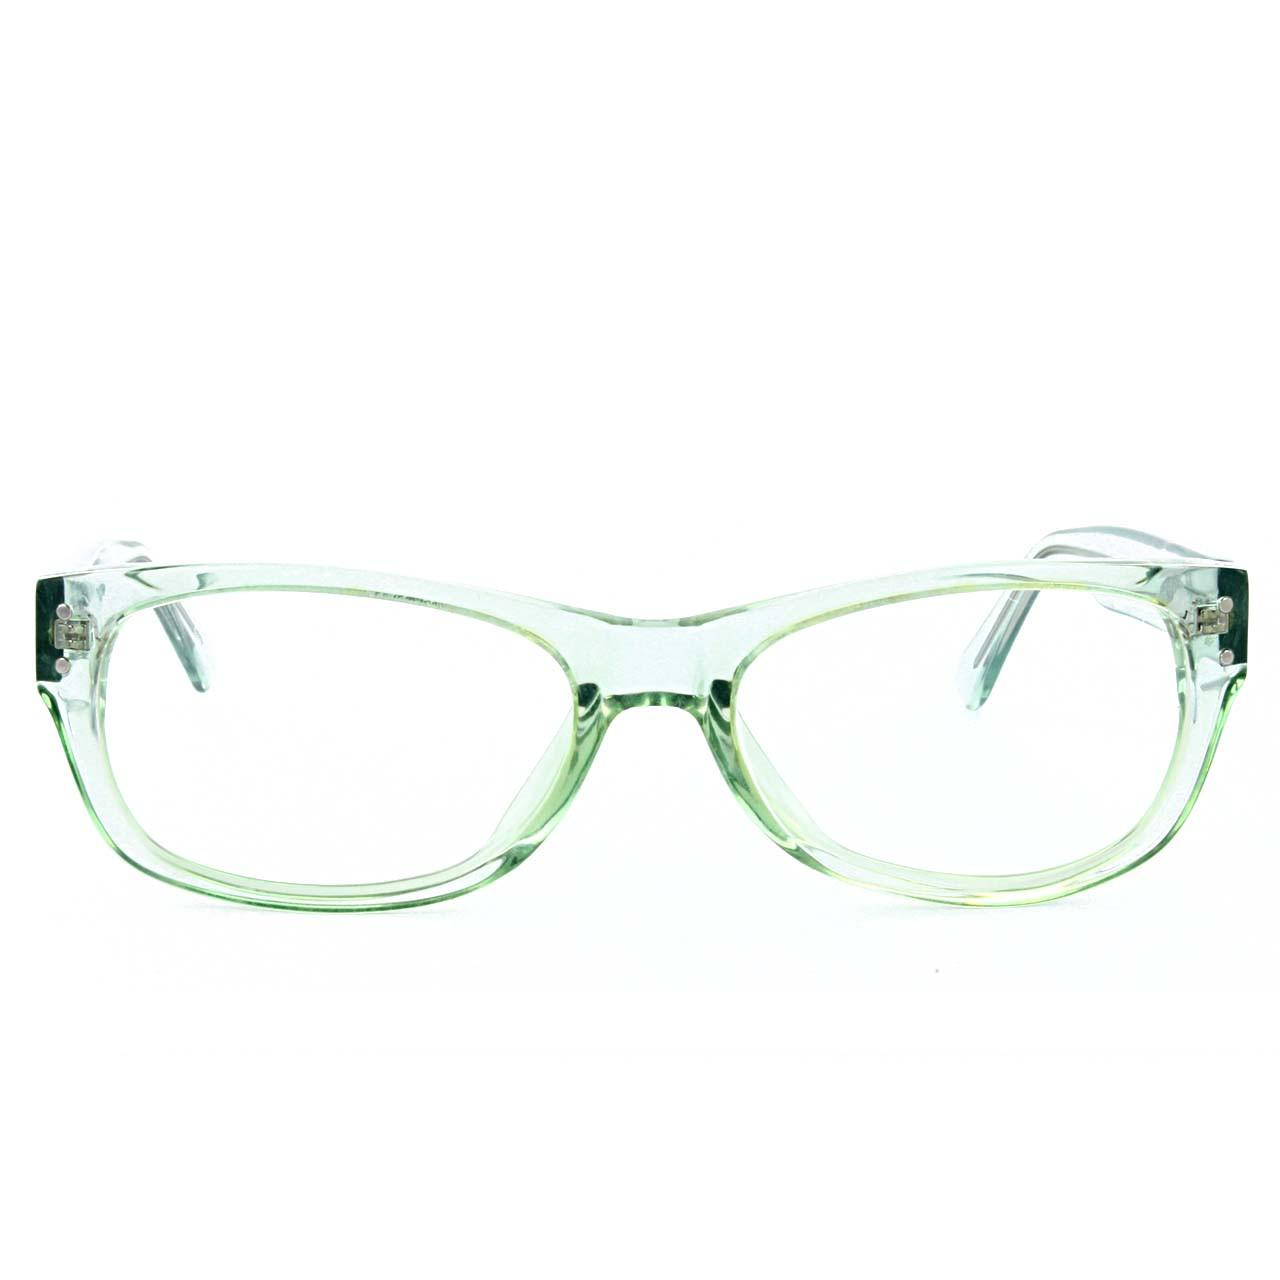 Geek Eyewear Geek 126